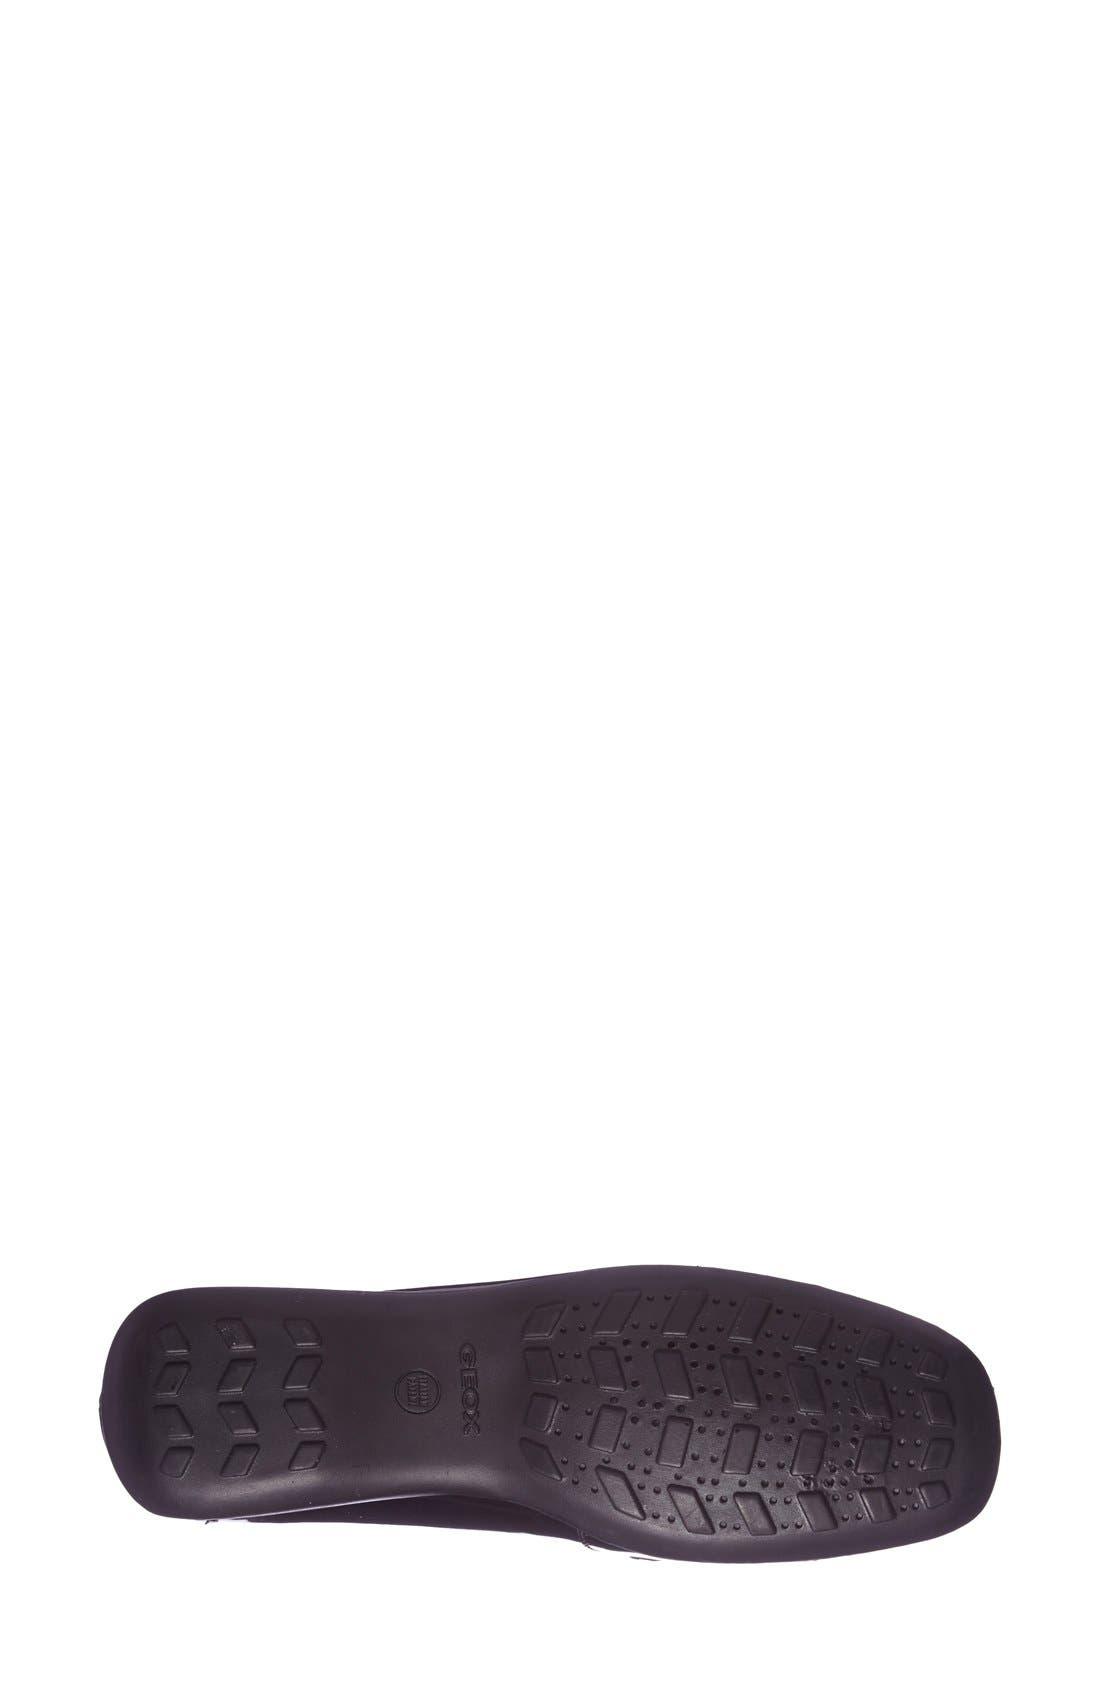 Euro 67 Loafer,                             Alternate thumbnail 8, color,                             002